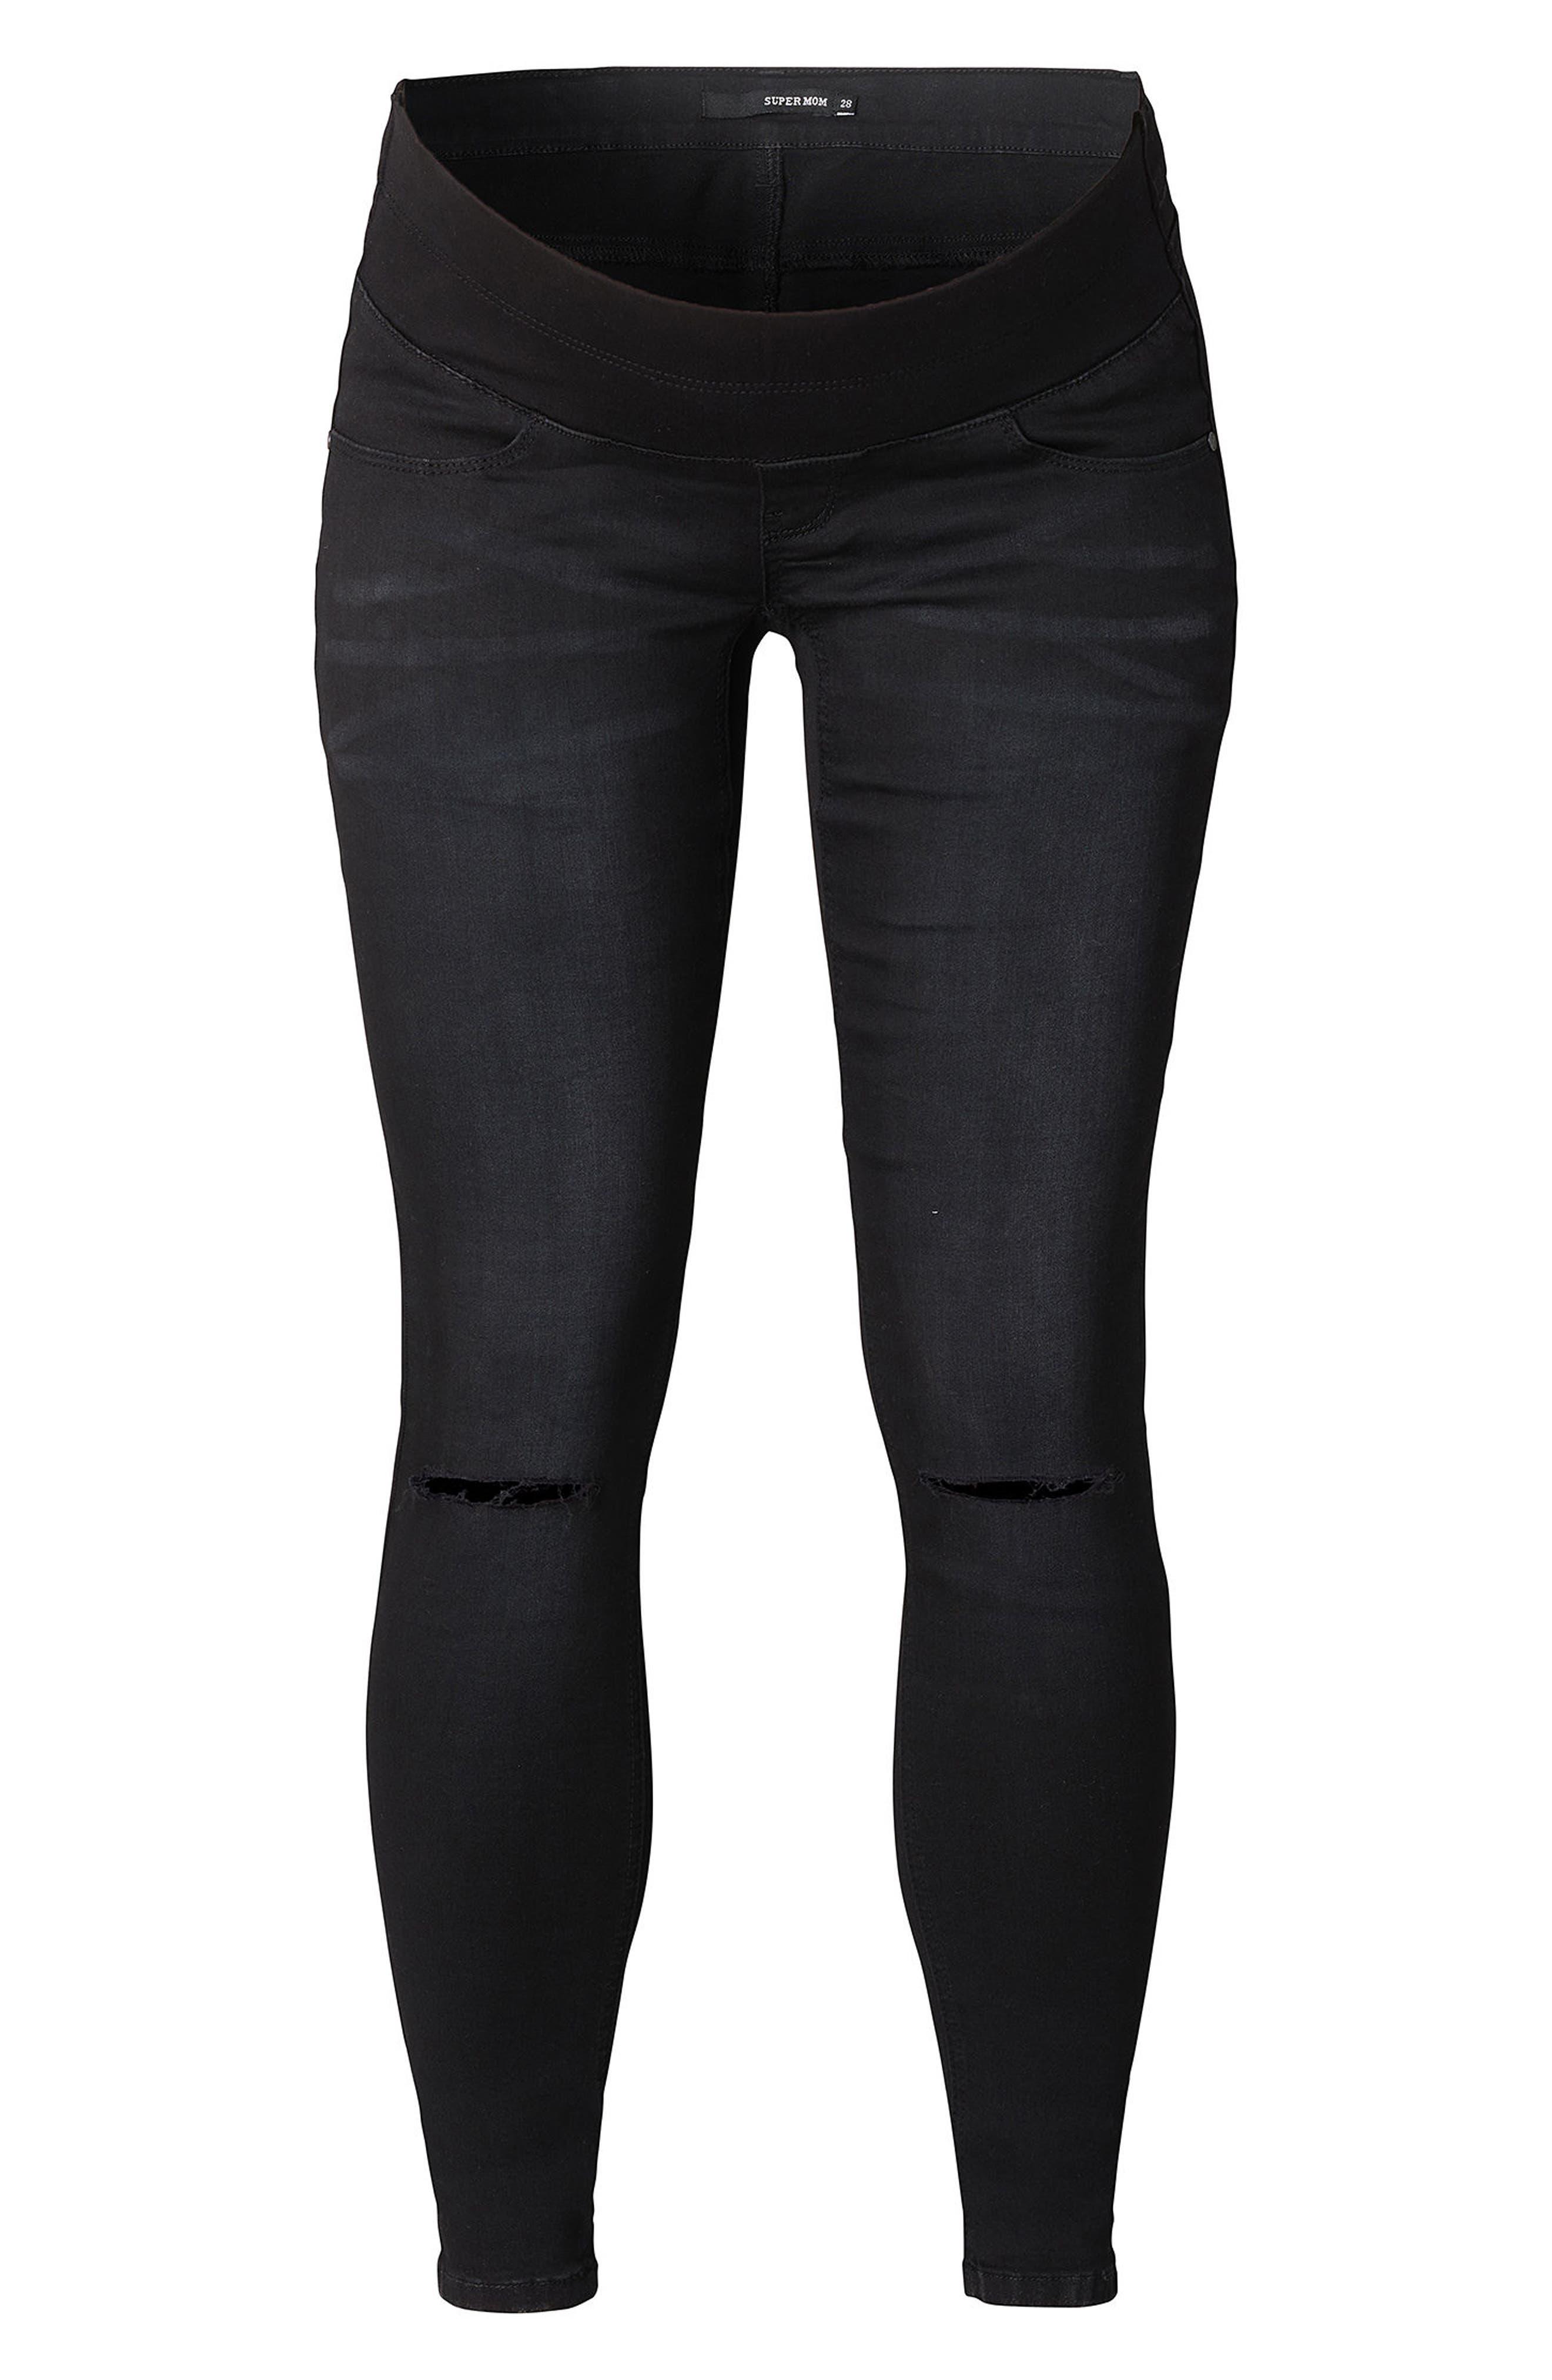 Under the Belly Skinny Maternity Jeans,                             Alternate thumbnail 2, color,                             BLACK DENIM